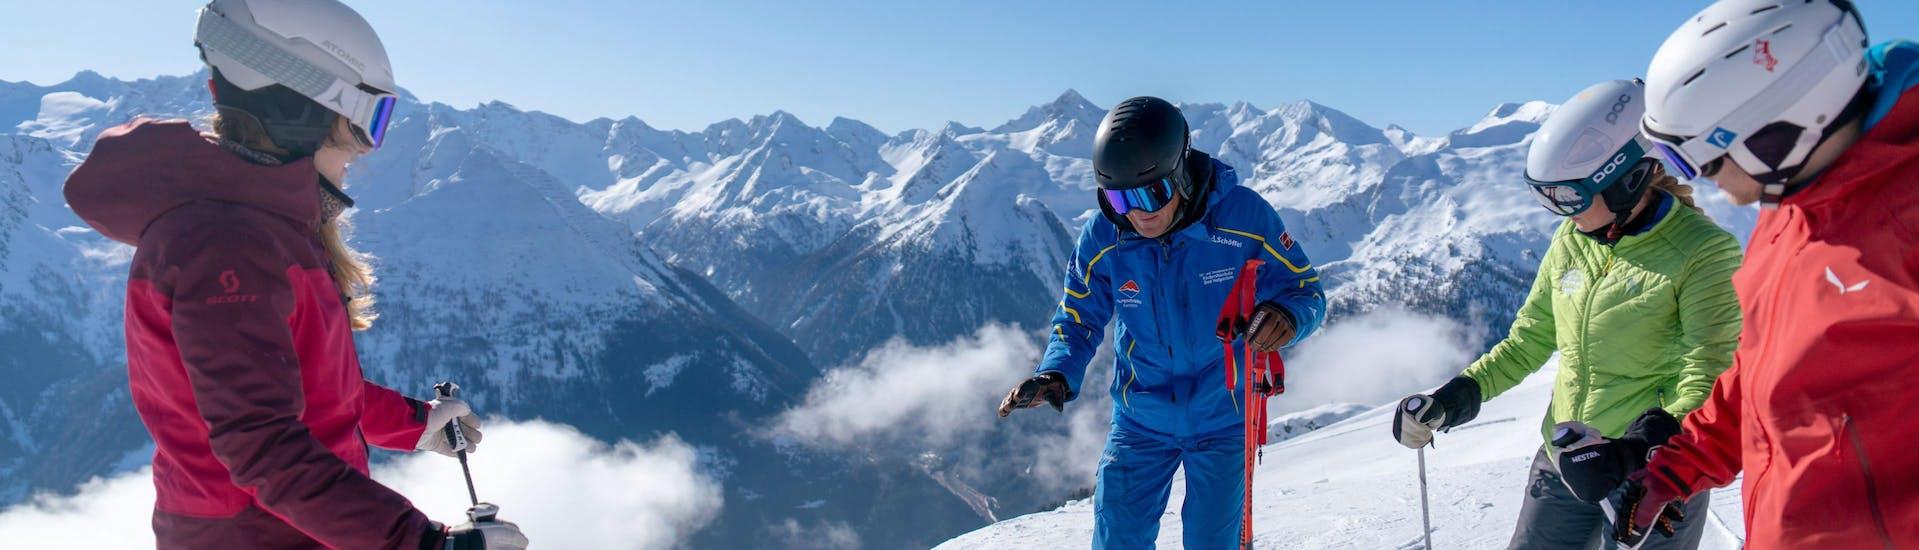 Adults Ski Lessons for Advanced